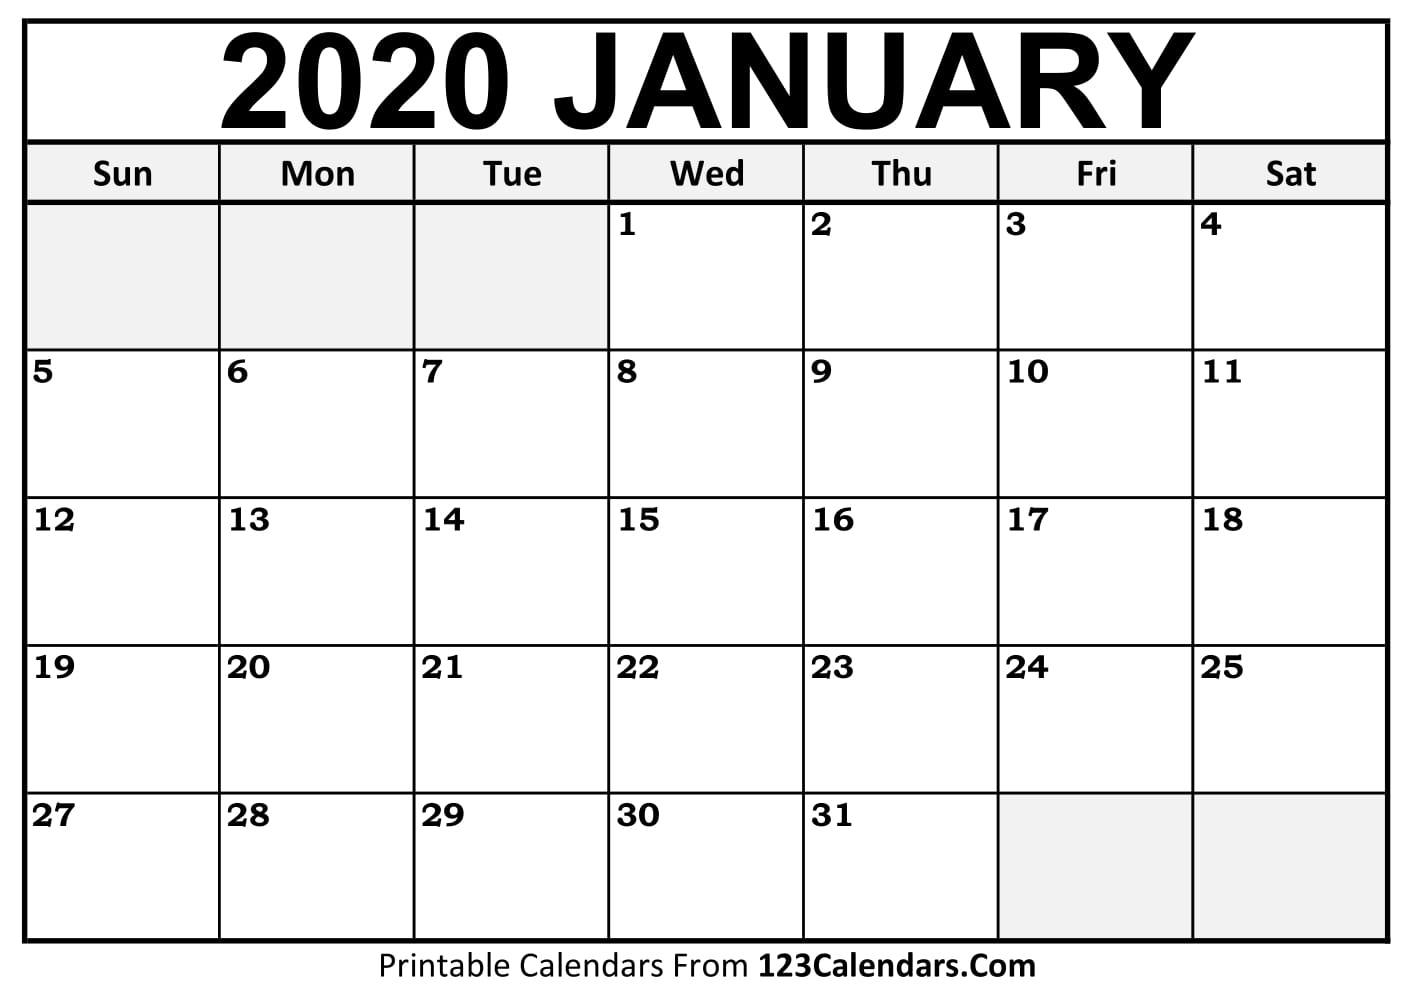 January 2020 Printable Calendar | 123Calendars in 2020 Fill In Calendar